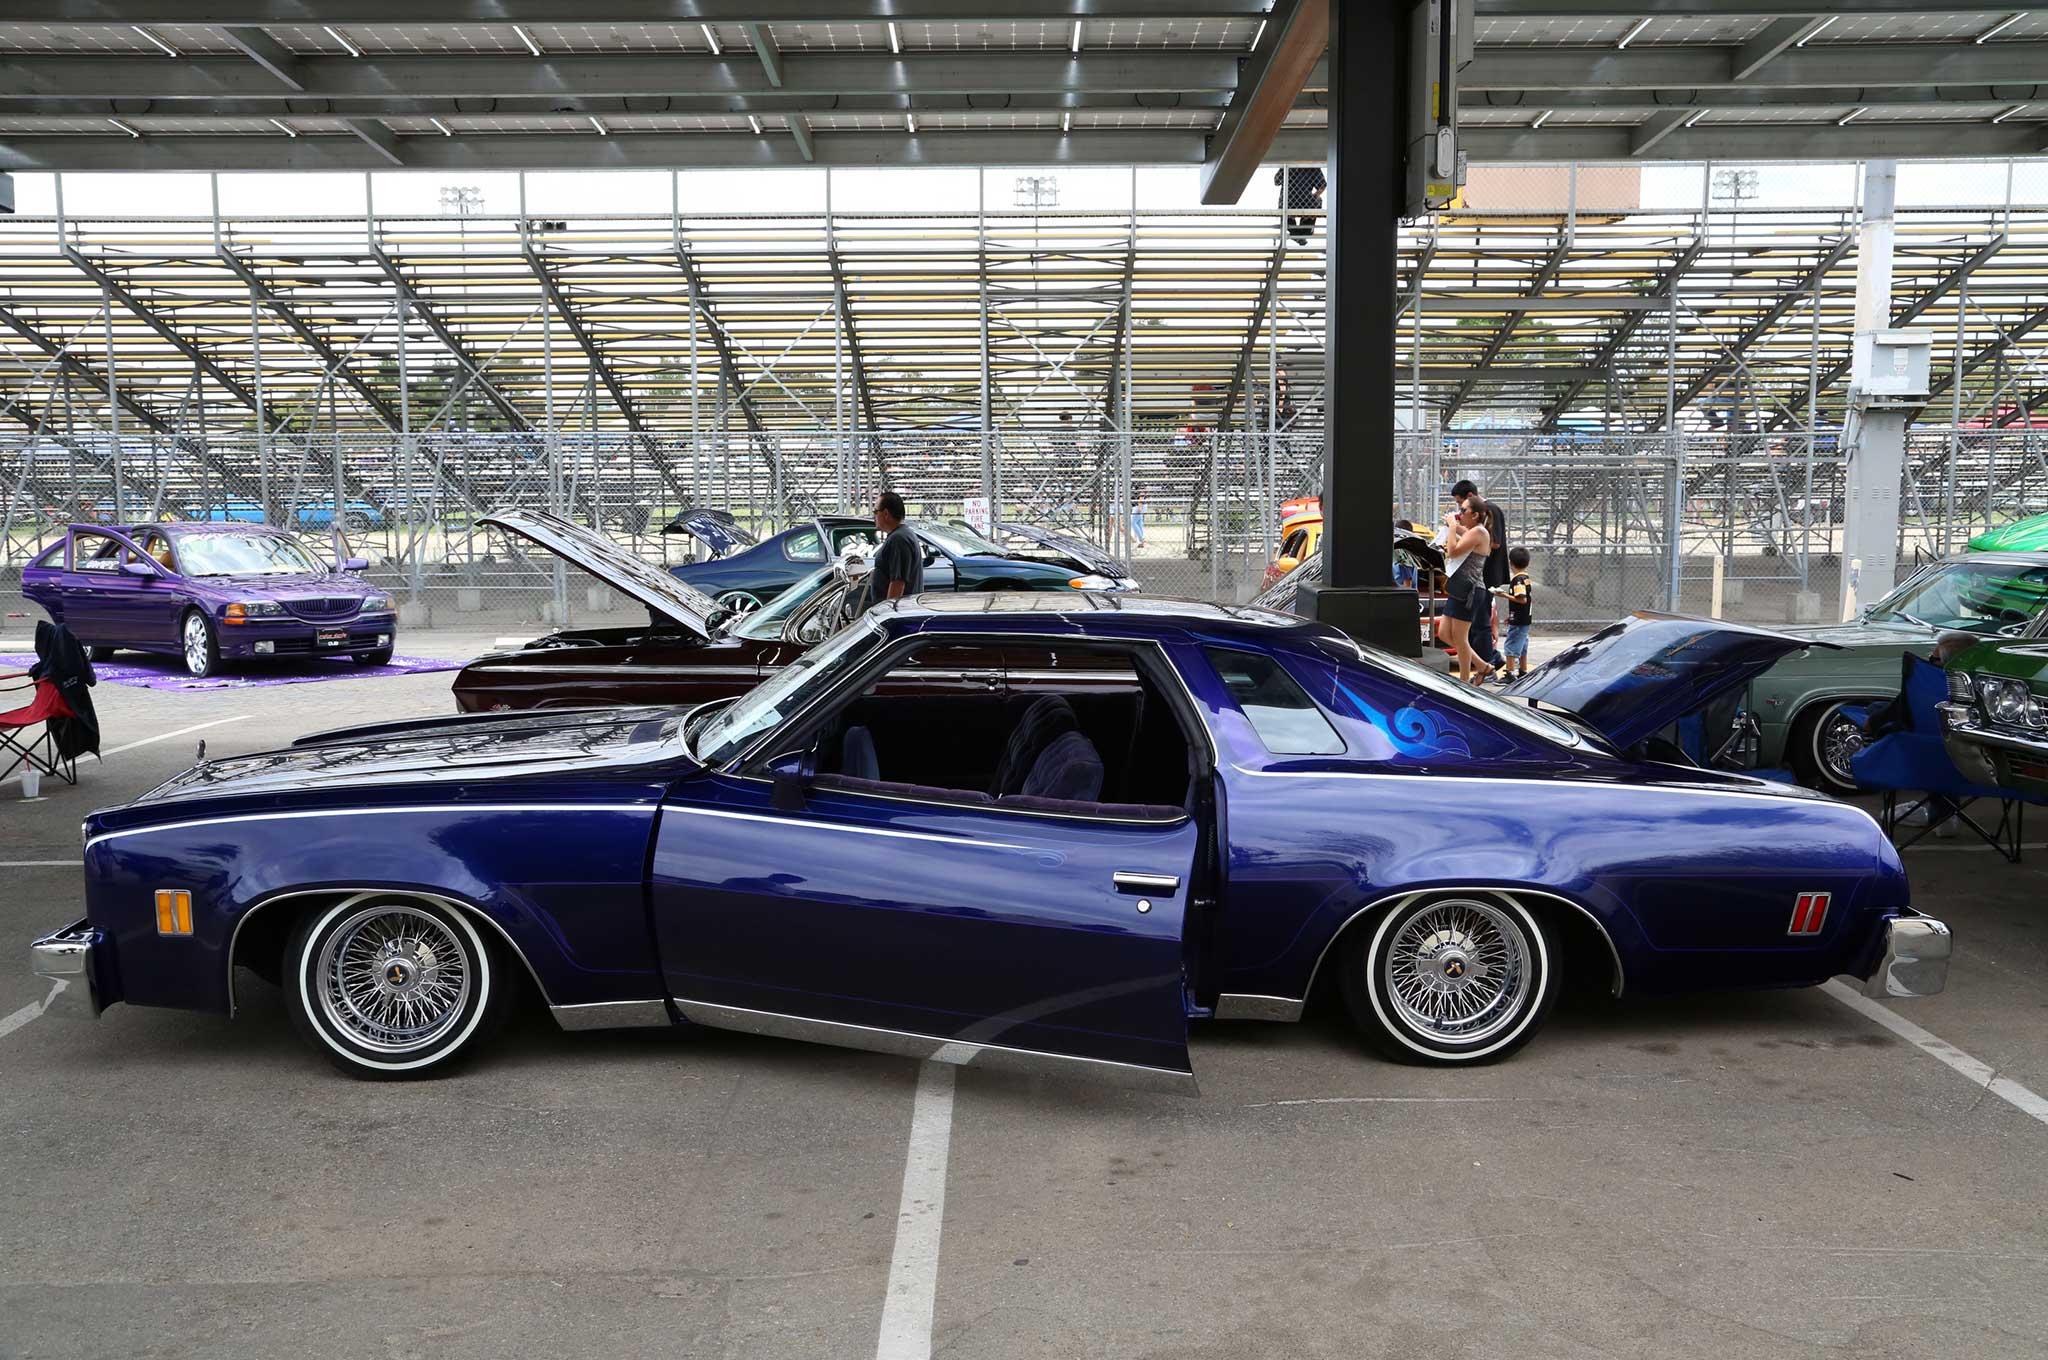 018 ol s sfv 2015 car show and concert chevrolet monte carlo